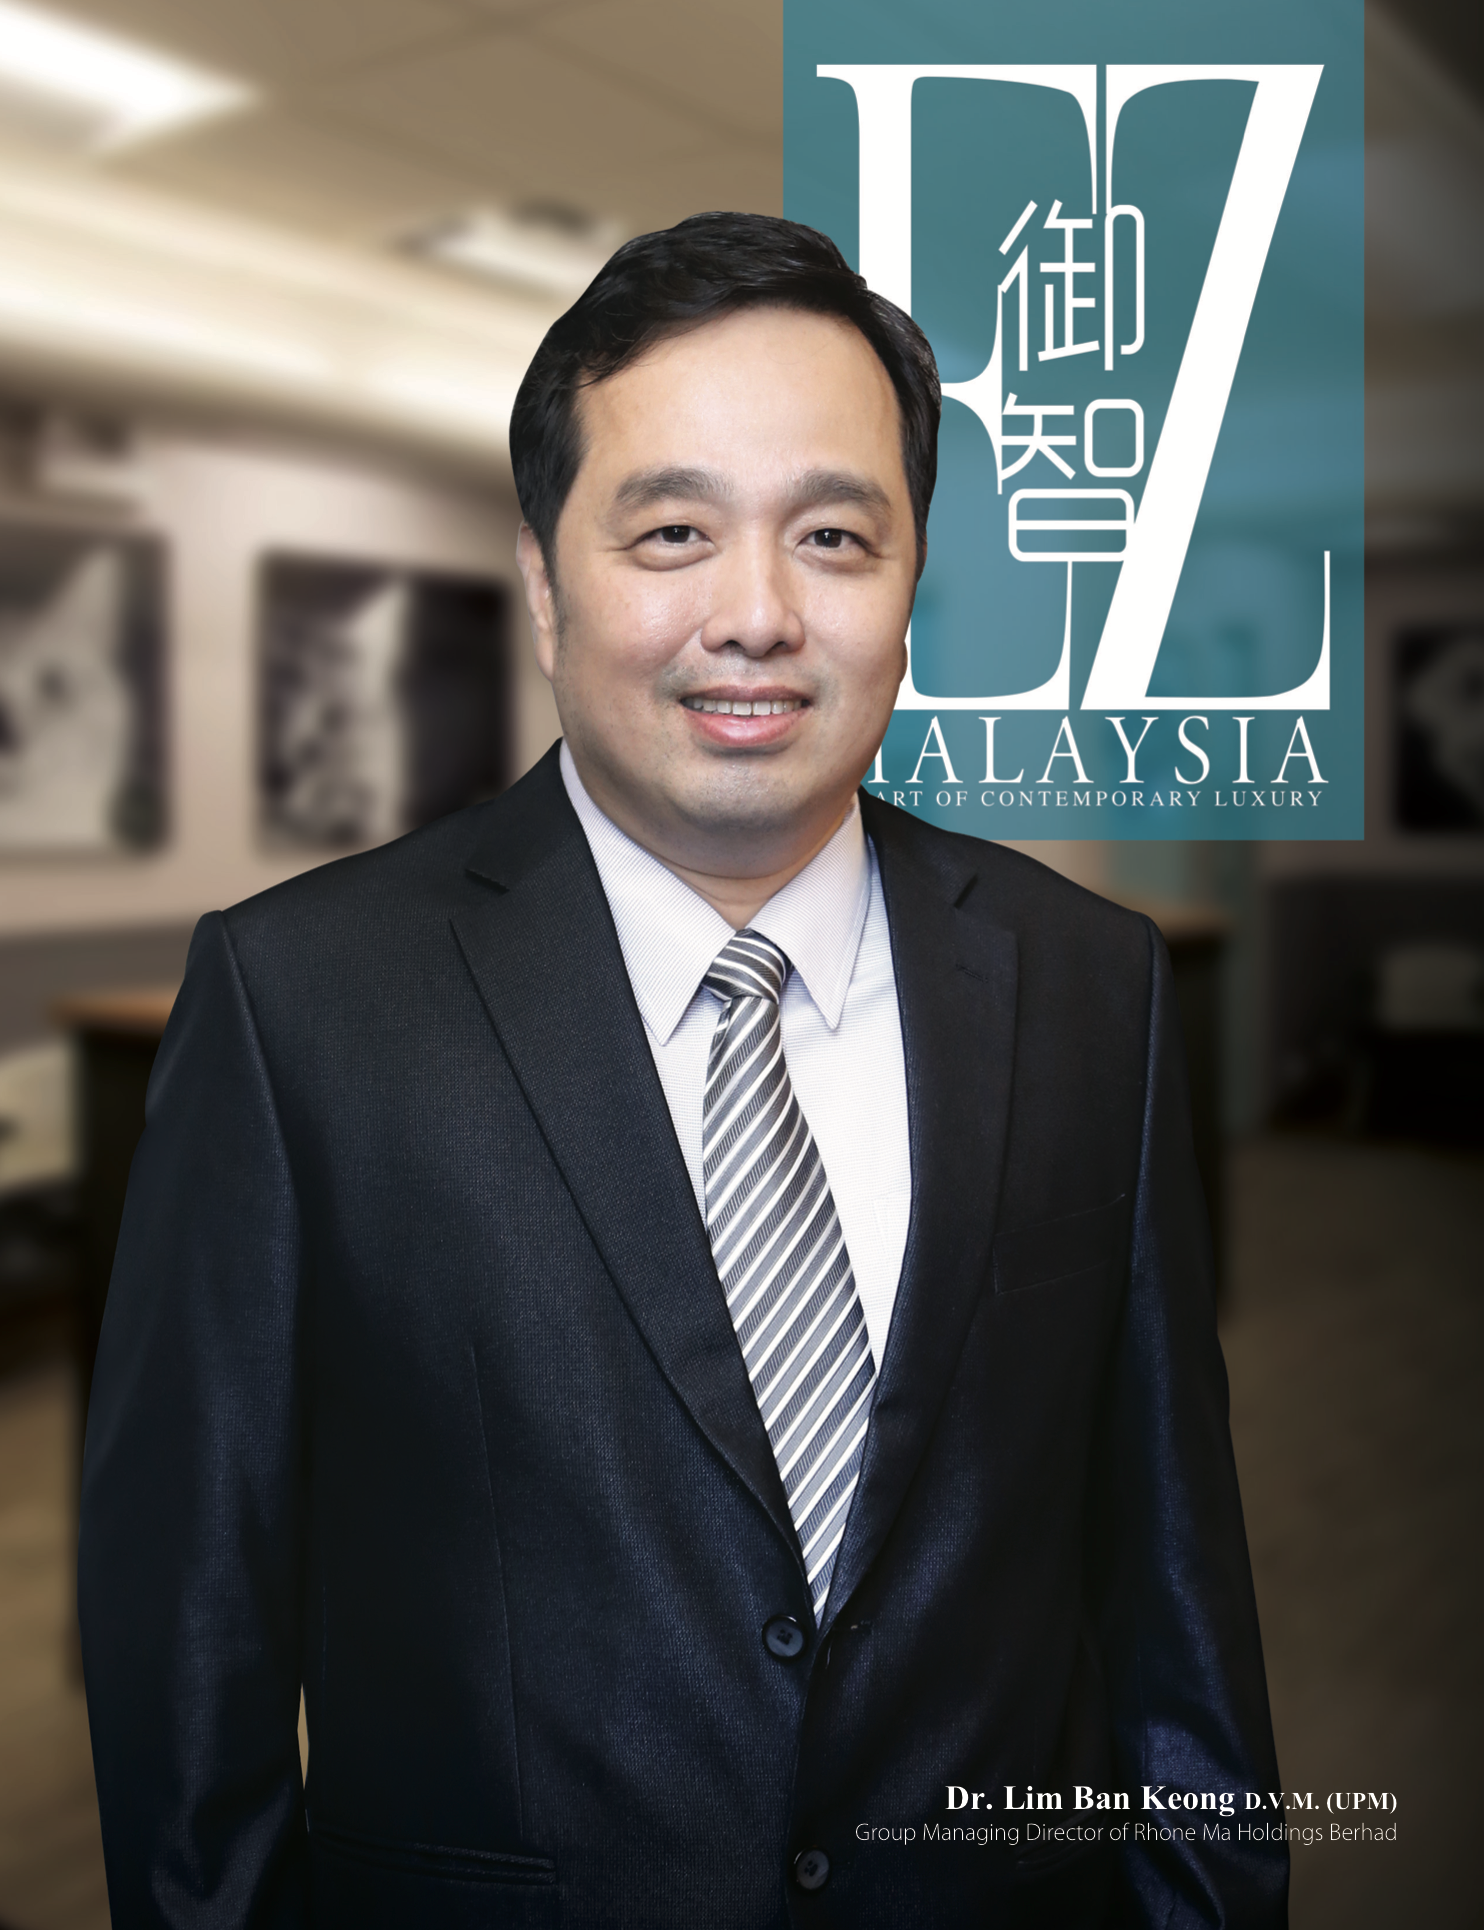 EZMY54_Dr Lim Ban Keong.png